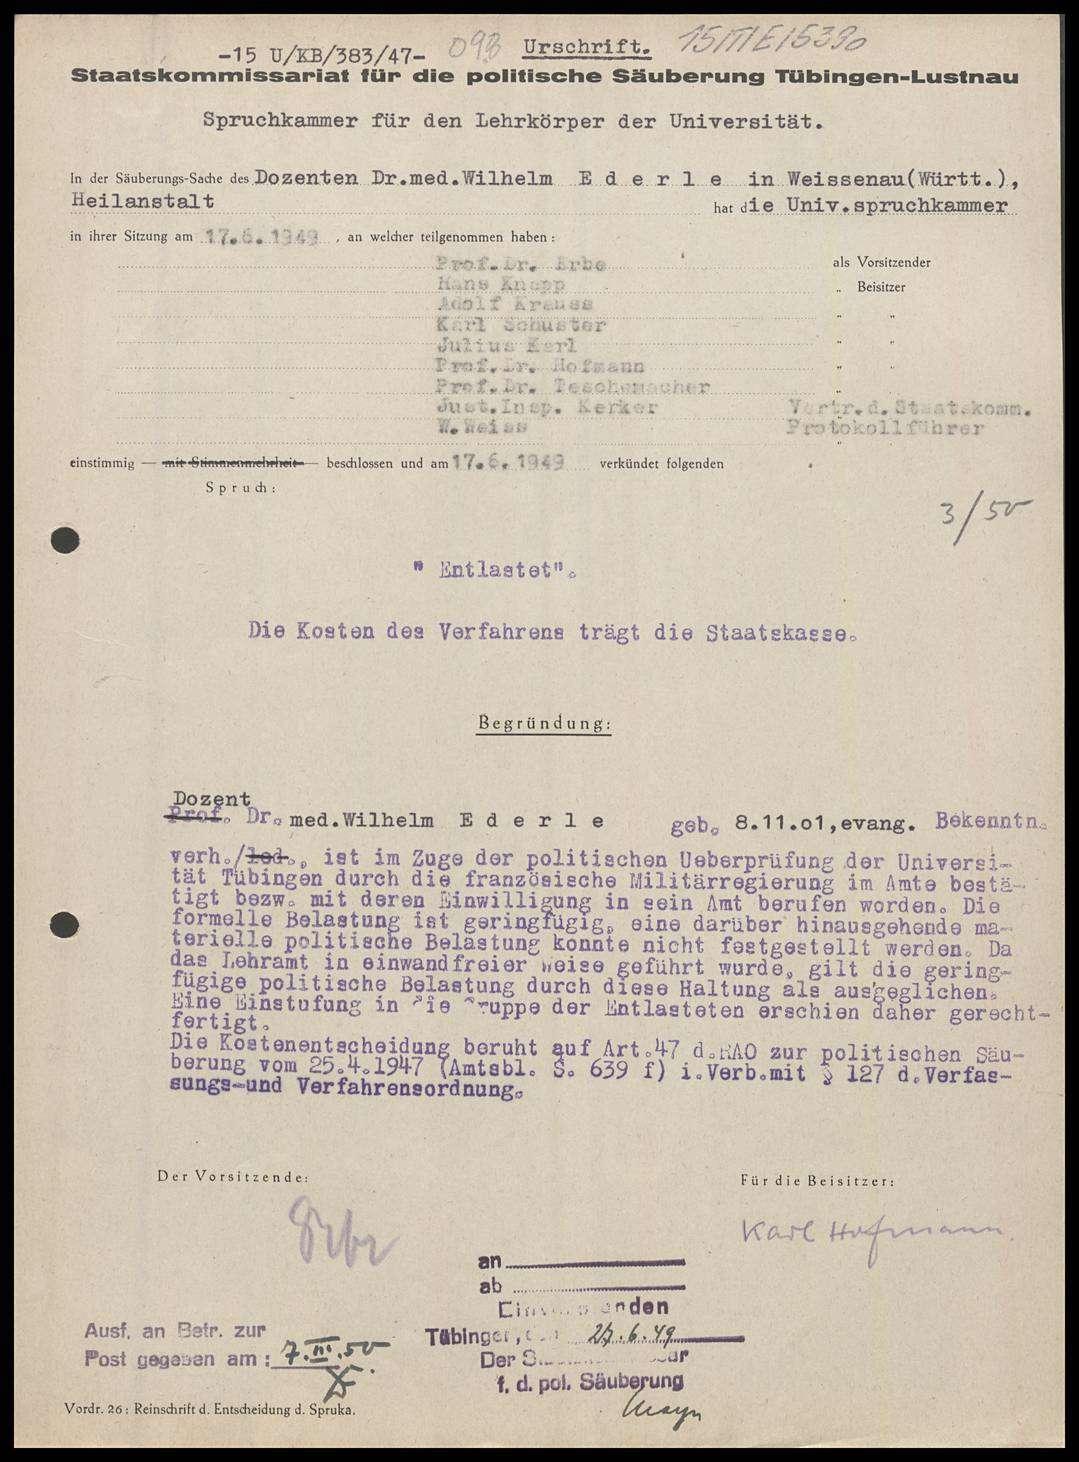 Ederle, Wilhelm, Dr. med., Bild 1